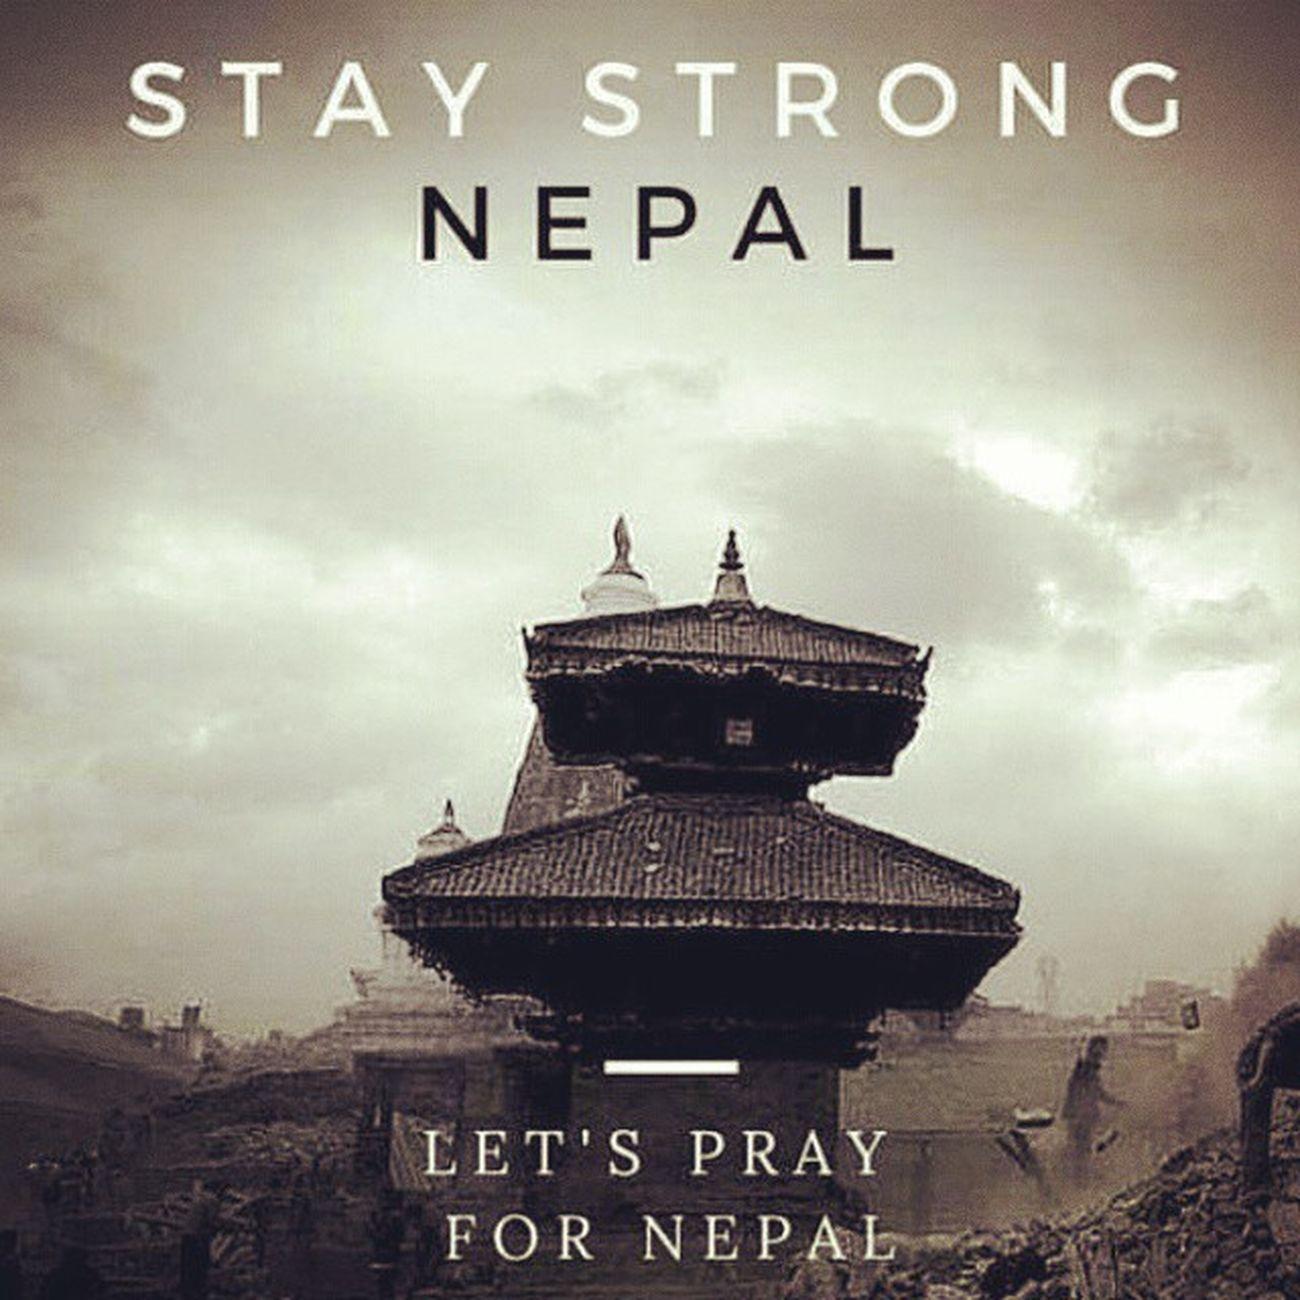 PrayforNepal Nepal Earthquake HilaDala Stay Strong E